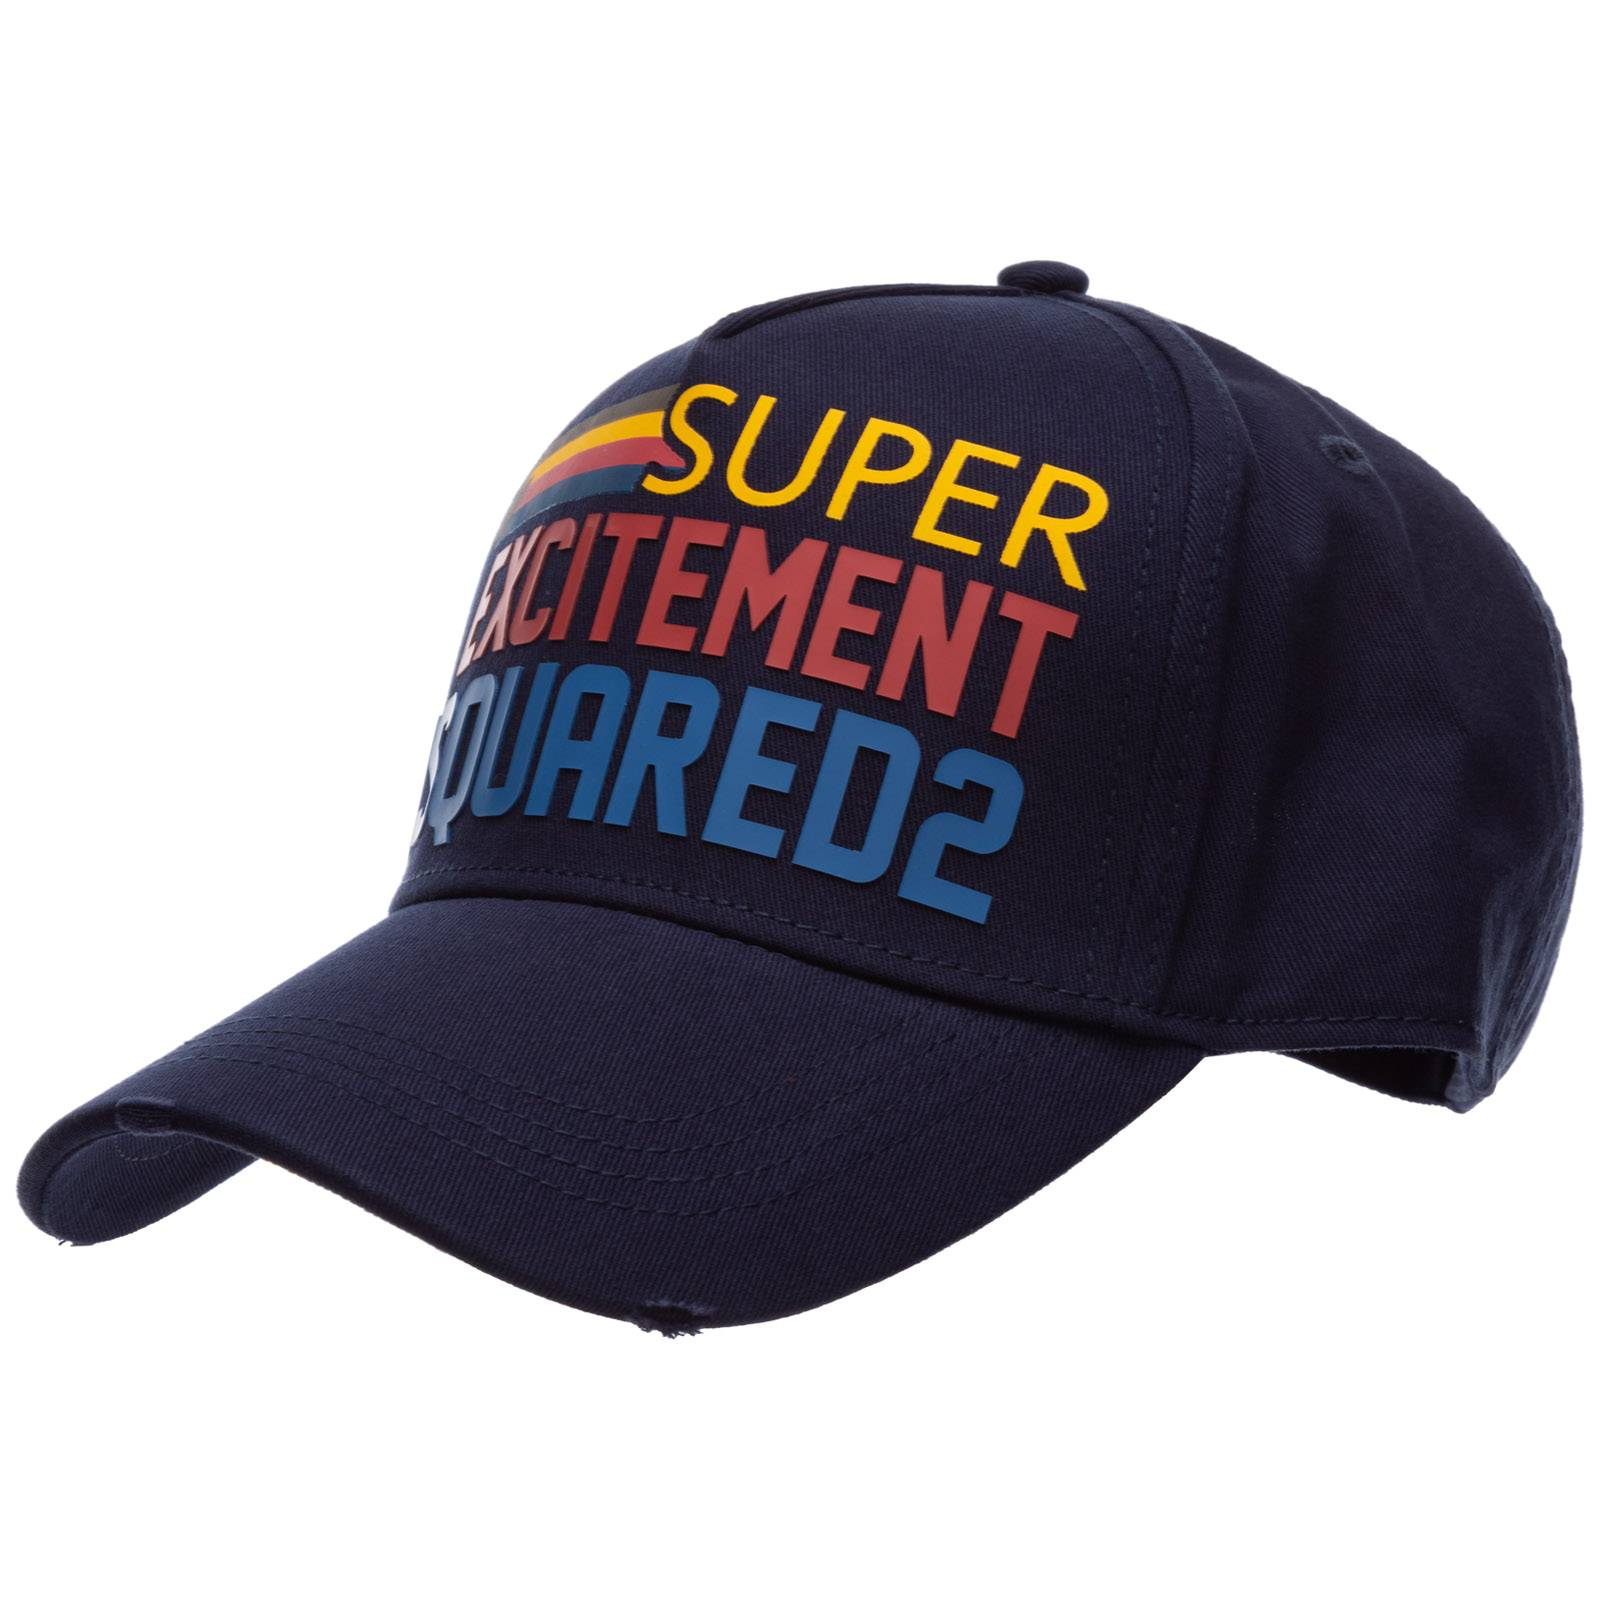 Dsquared2 Adjustable men's cotton hat baseball cap baseball  - Blue